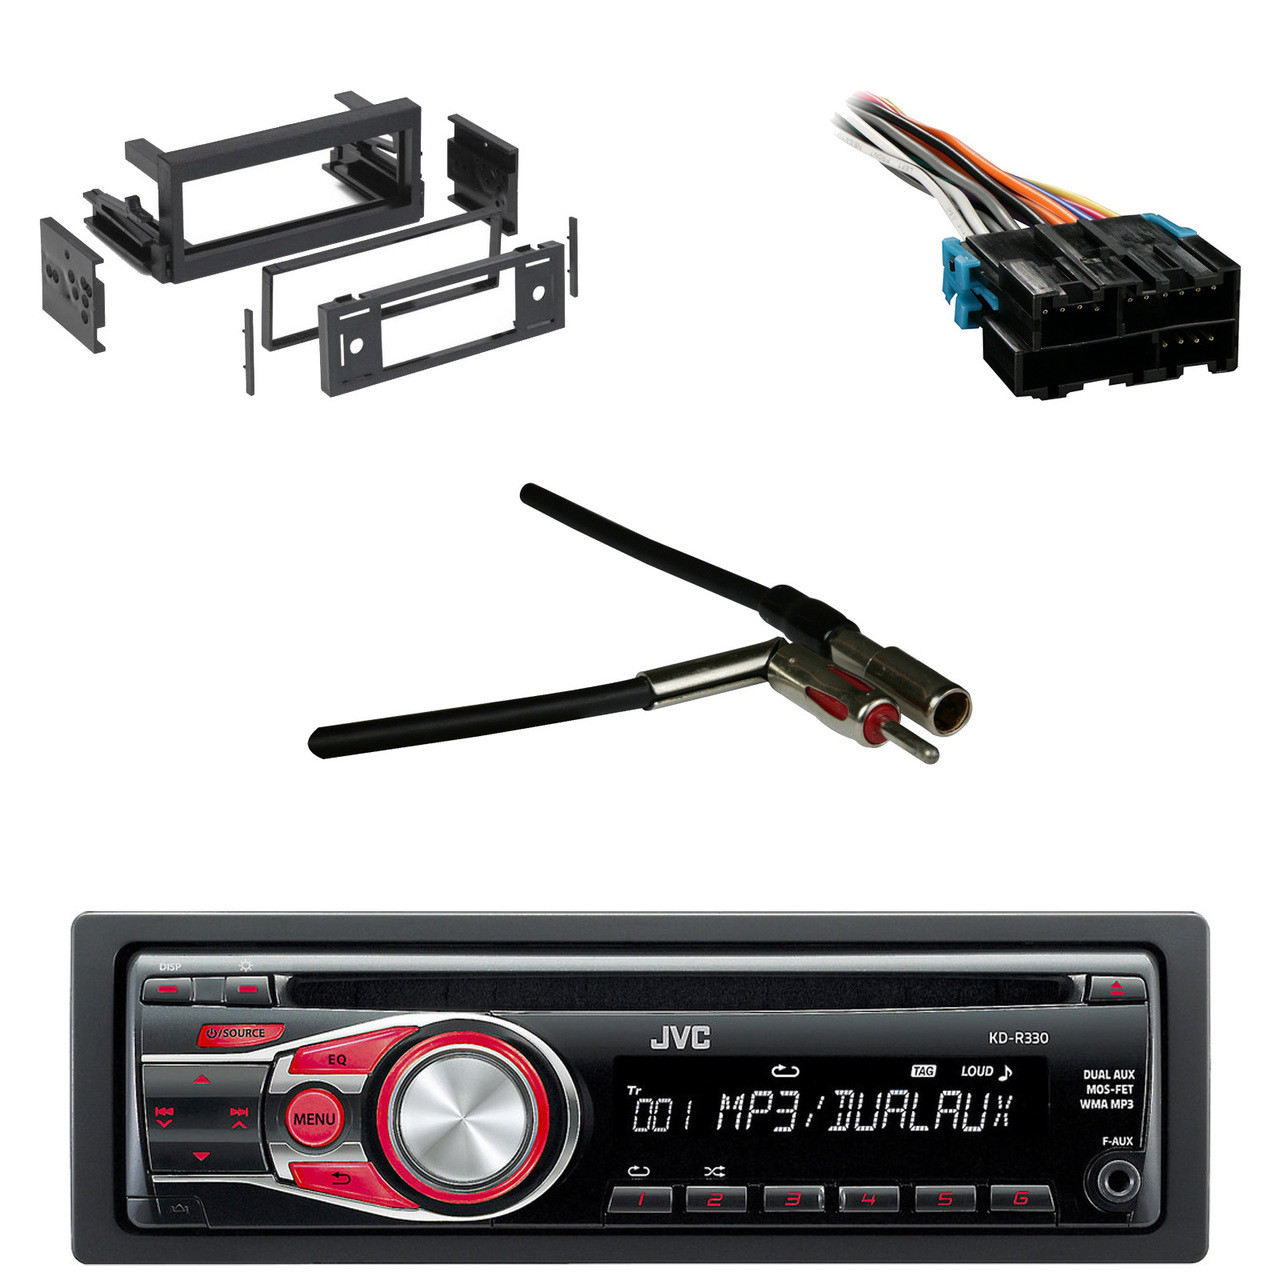 Jvc Kd Wiring Harness simple car stereo wiring diagram ... Jvc Kd R Wiring Harness on